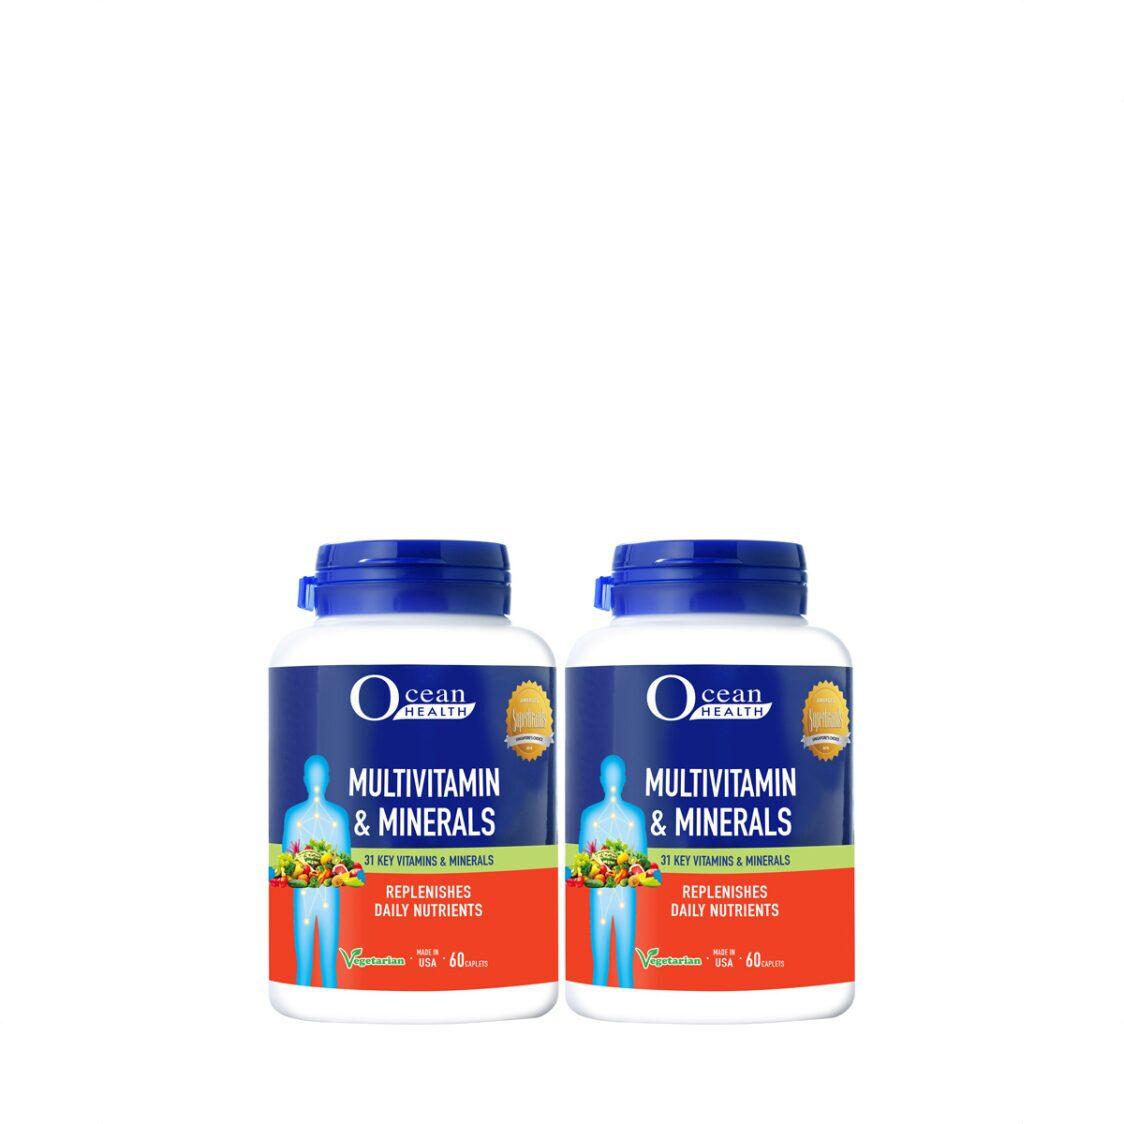 Ocean Health Multivitamin  Min Caplet 2x60s